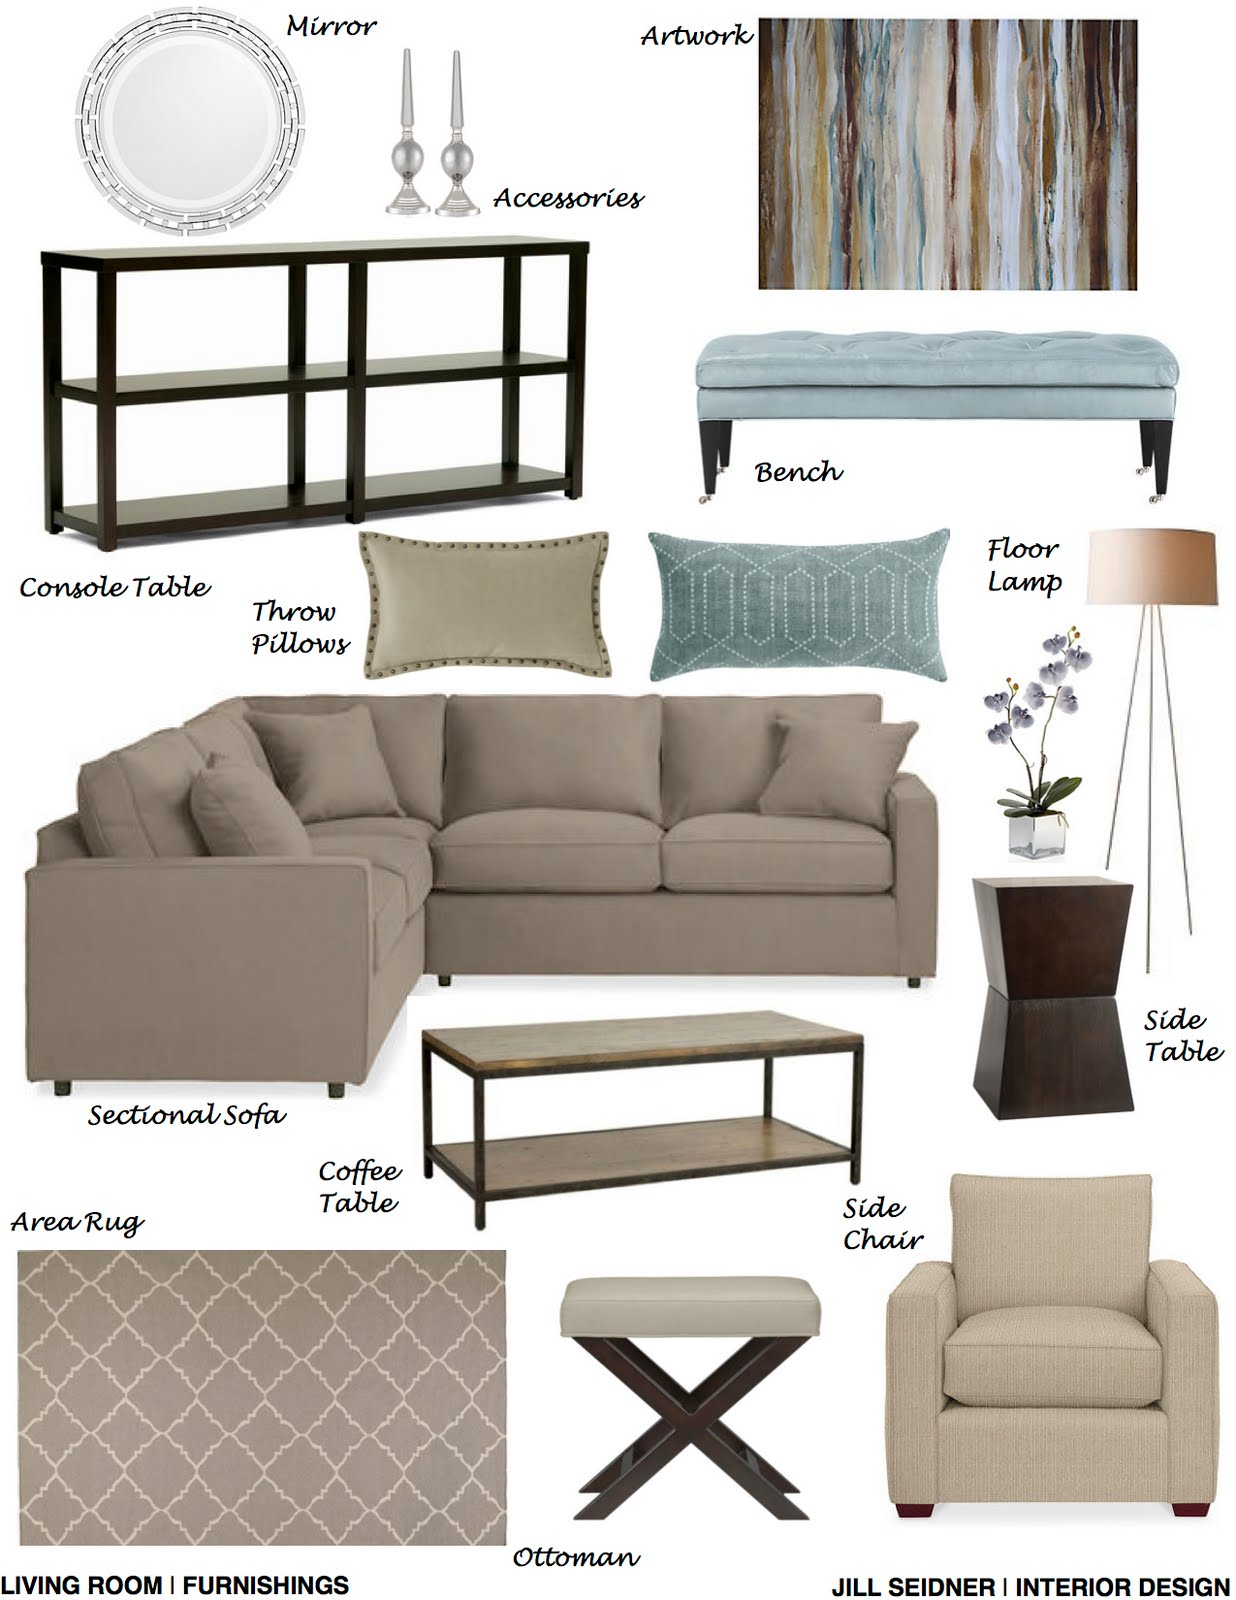 Jill Seidner Interior Design Online Design E Decorating Services Virtual Interior Design